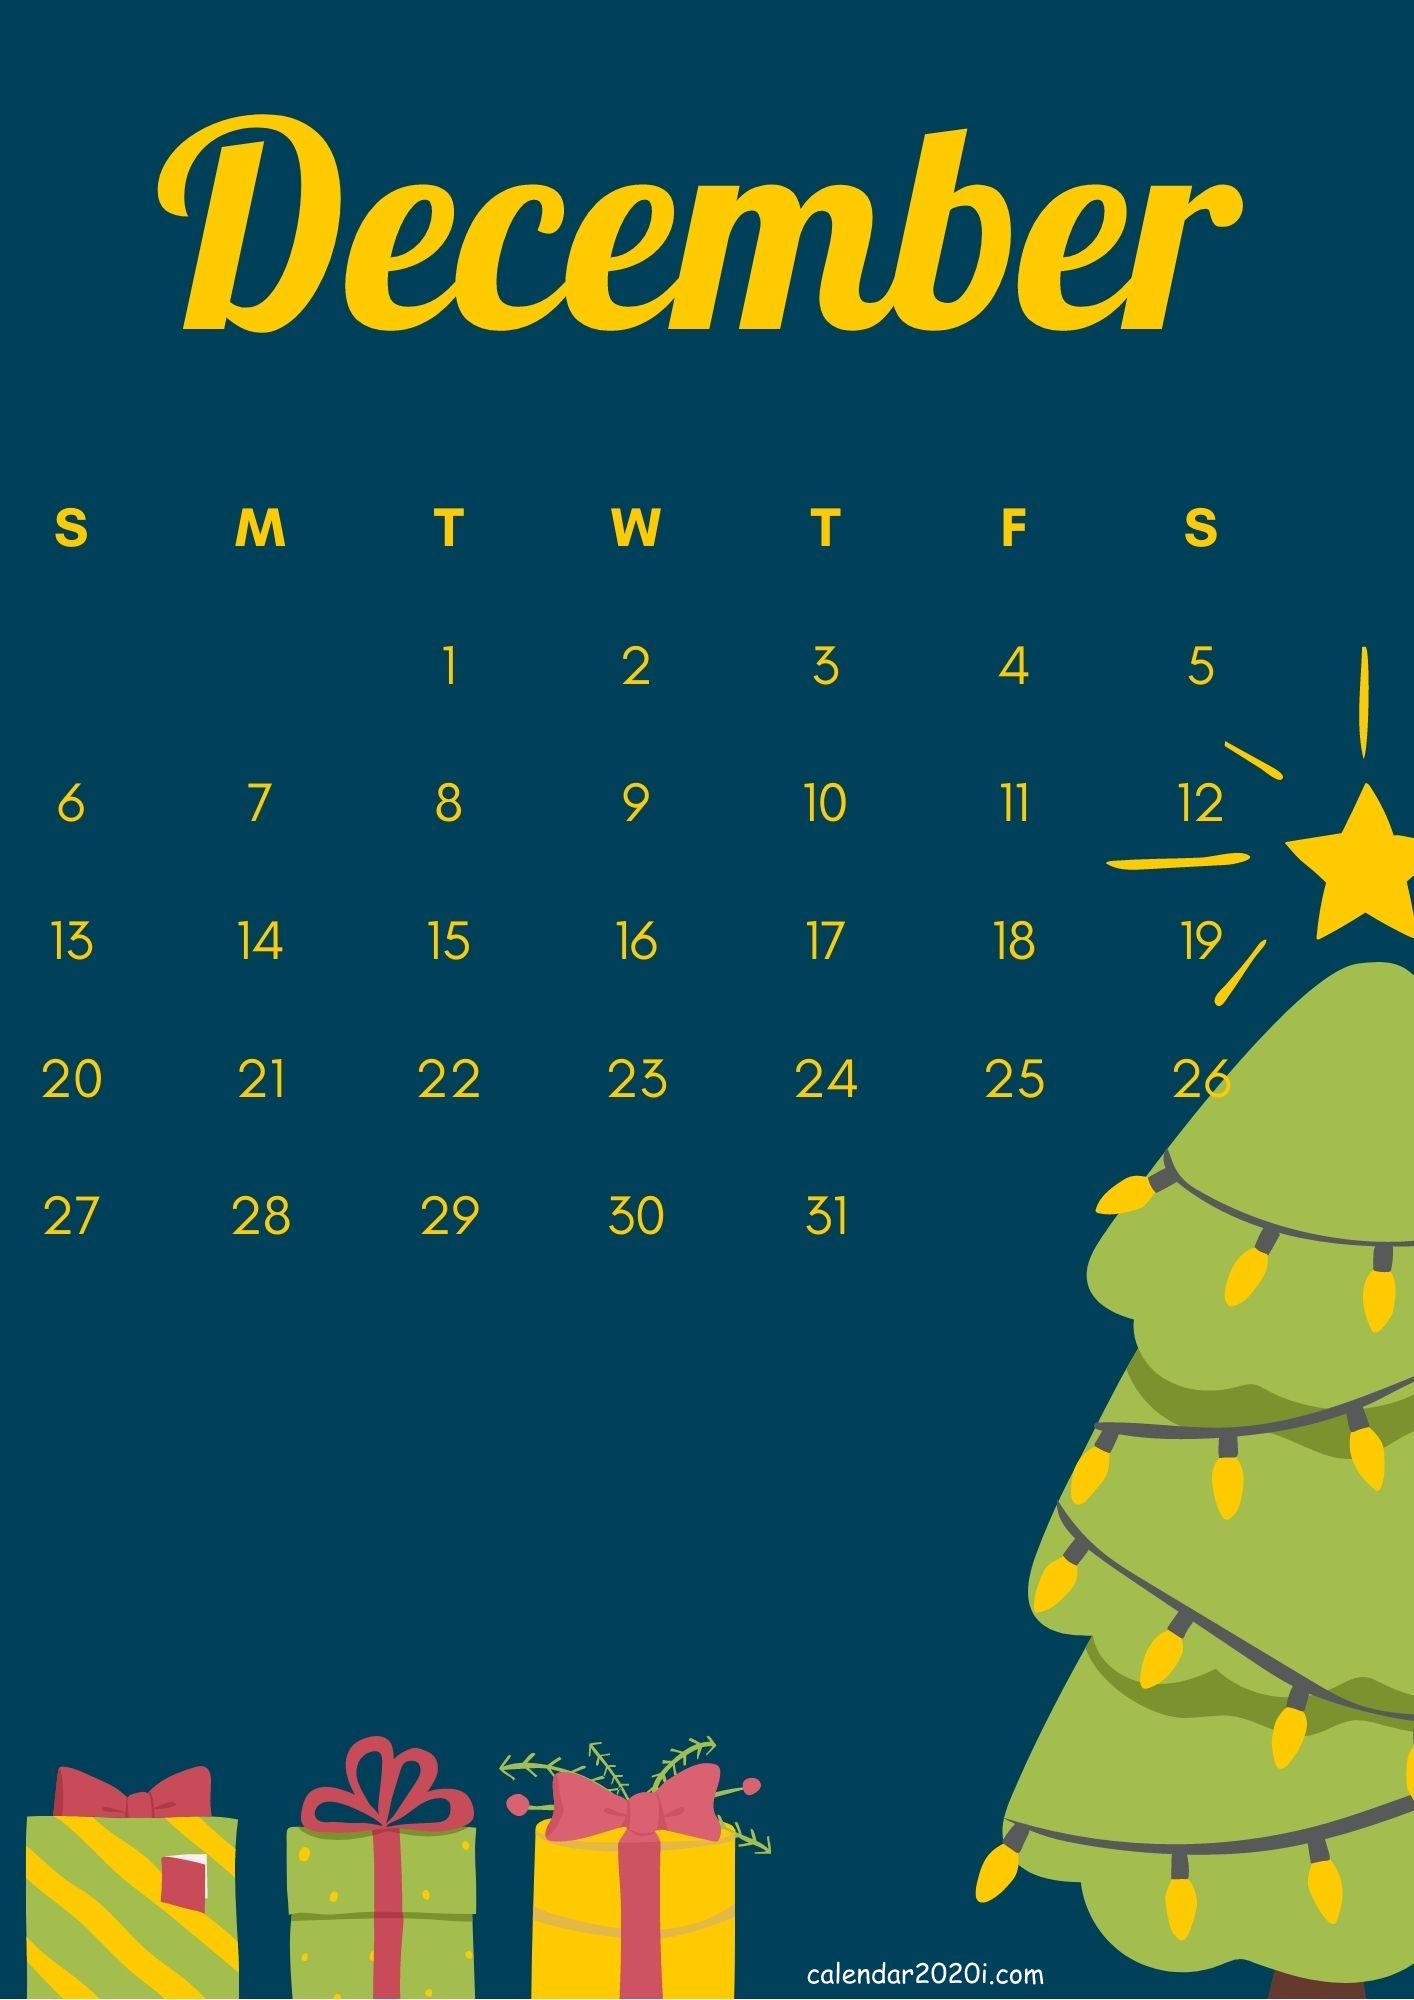 iPhone December 2020 Calendar HD Wallpapers Download 1414x2000